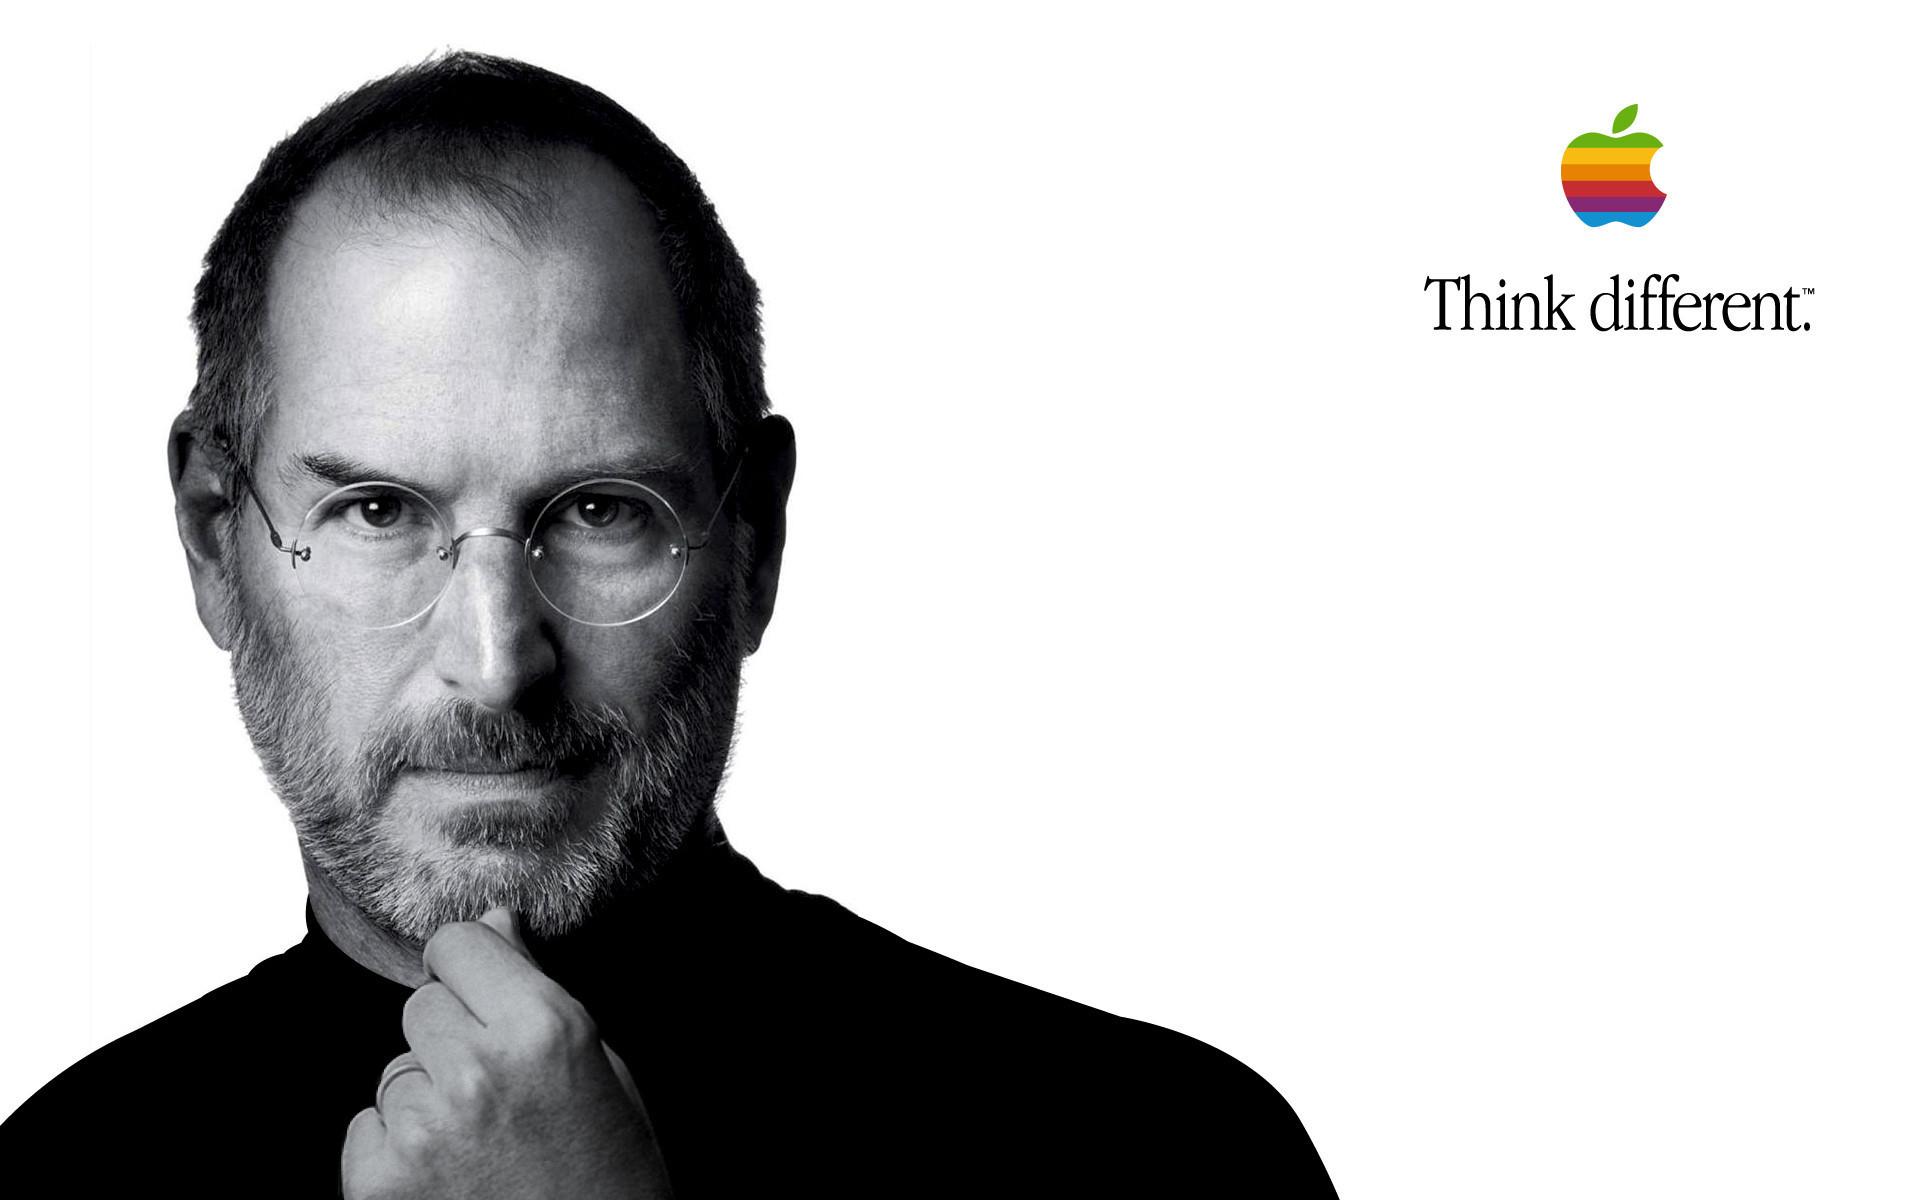 73 Steve Jobs Wallpapers On Wallpaperplay - Steve Jobs - HD Wallpaper